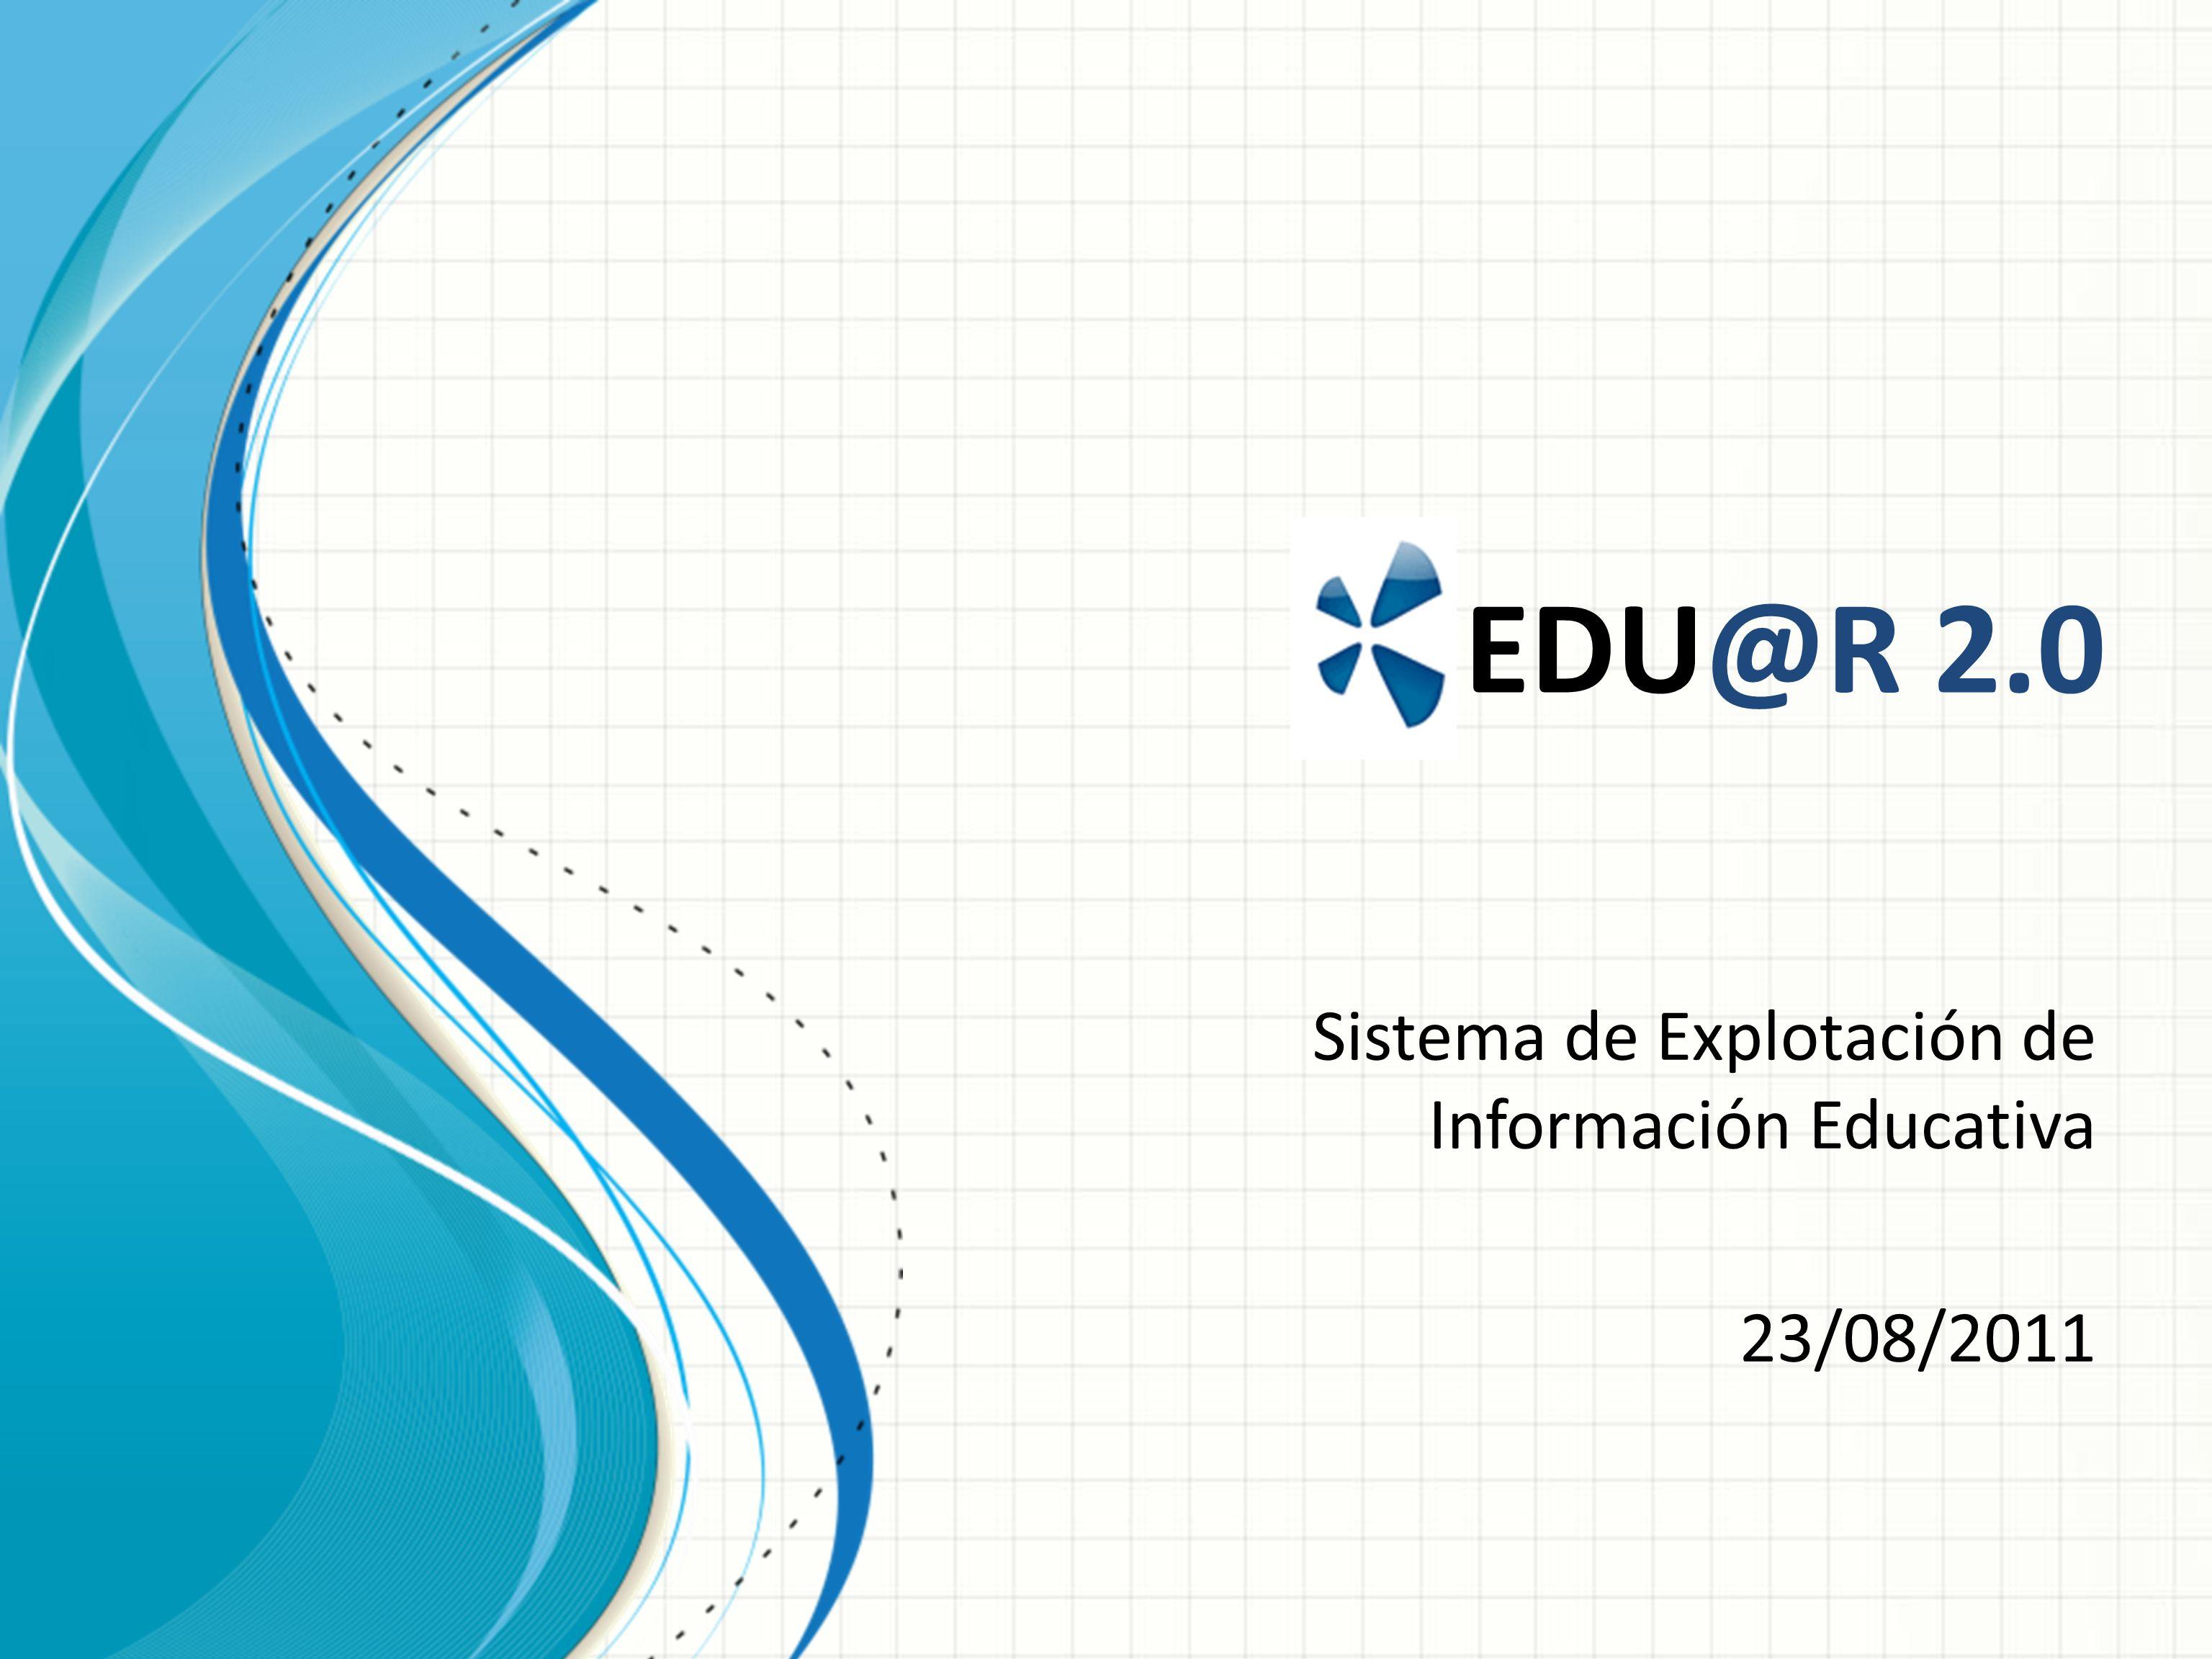 EDU@R 2.0 Sistema de Explotación de Información Educativa 23/08/2011